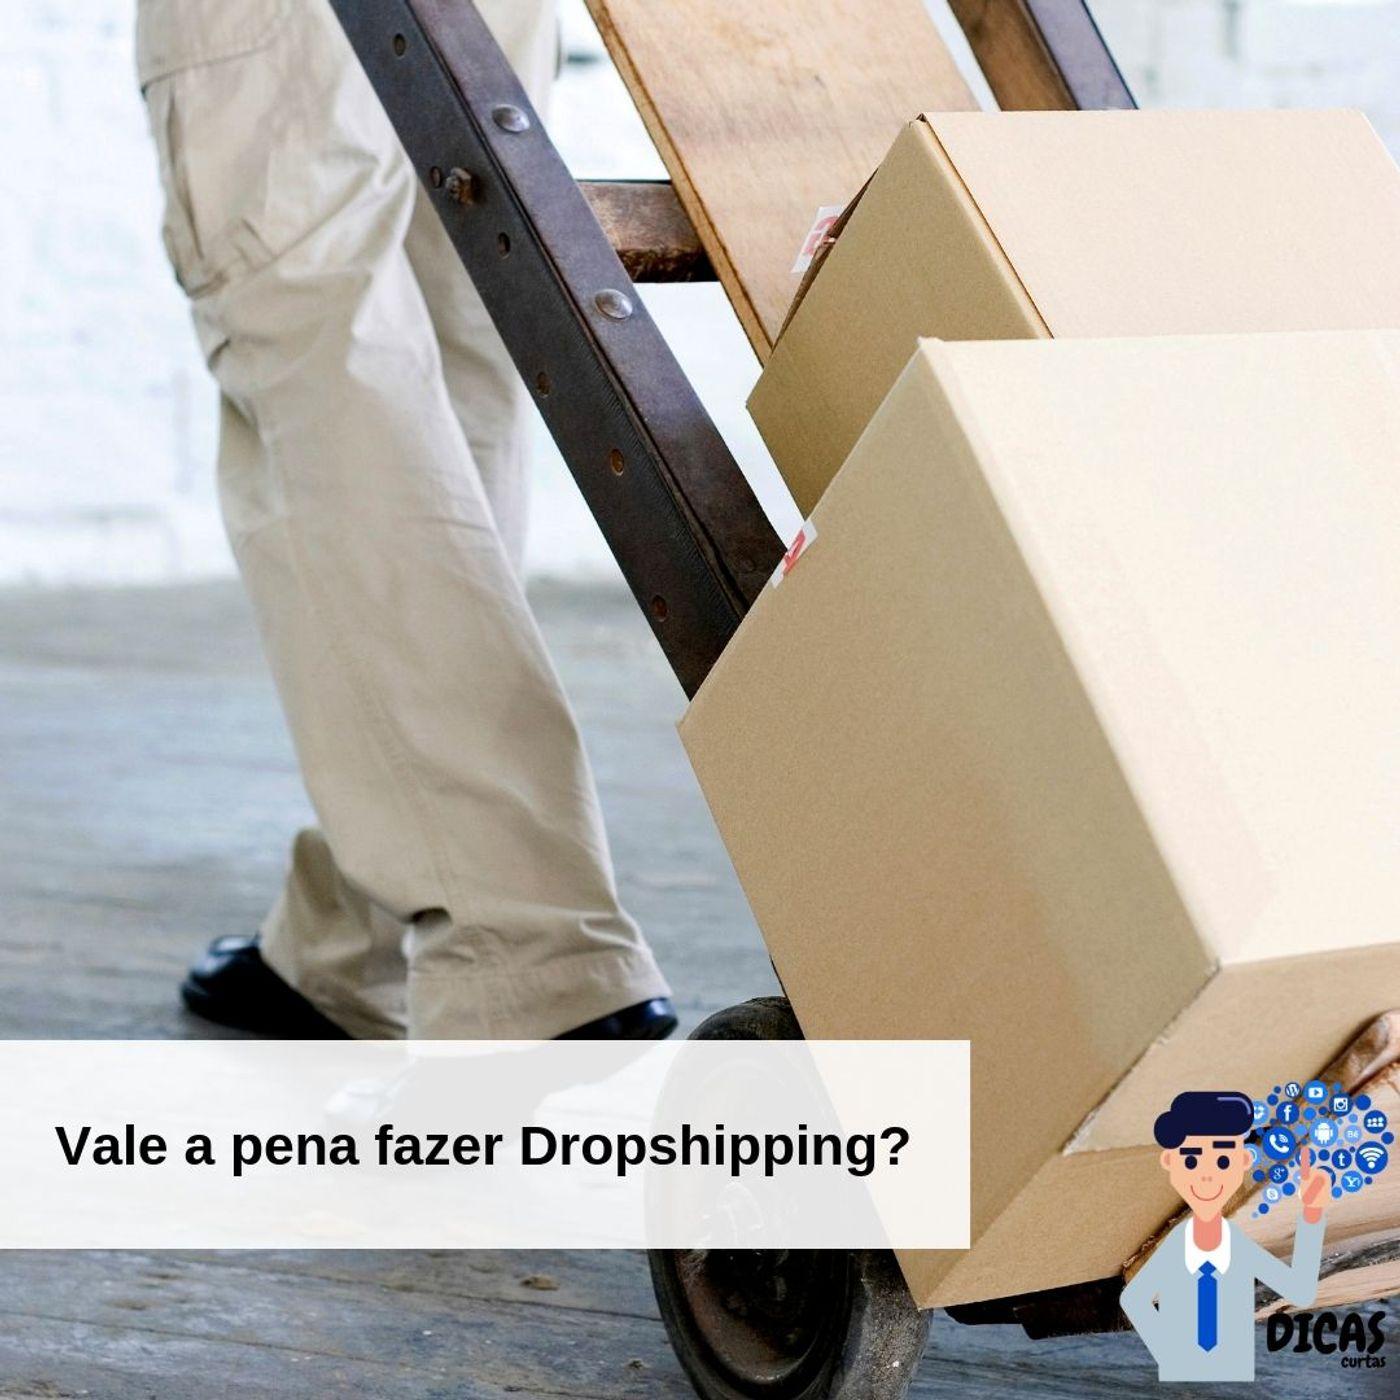 074 Vale a pena fazer Dropshipping?